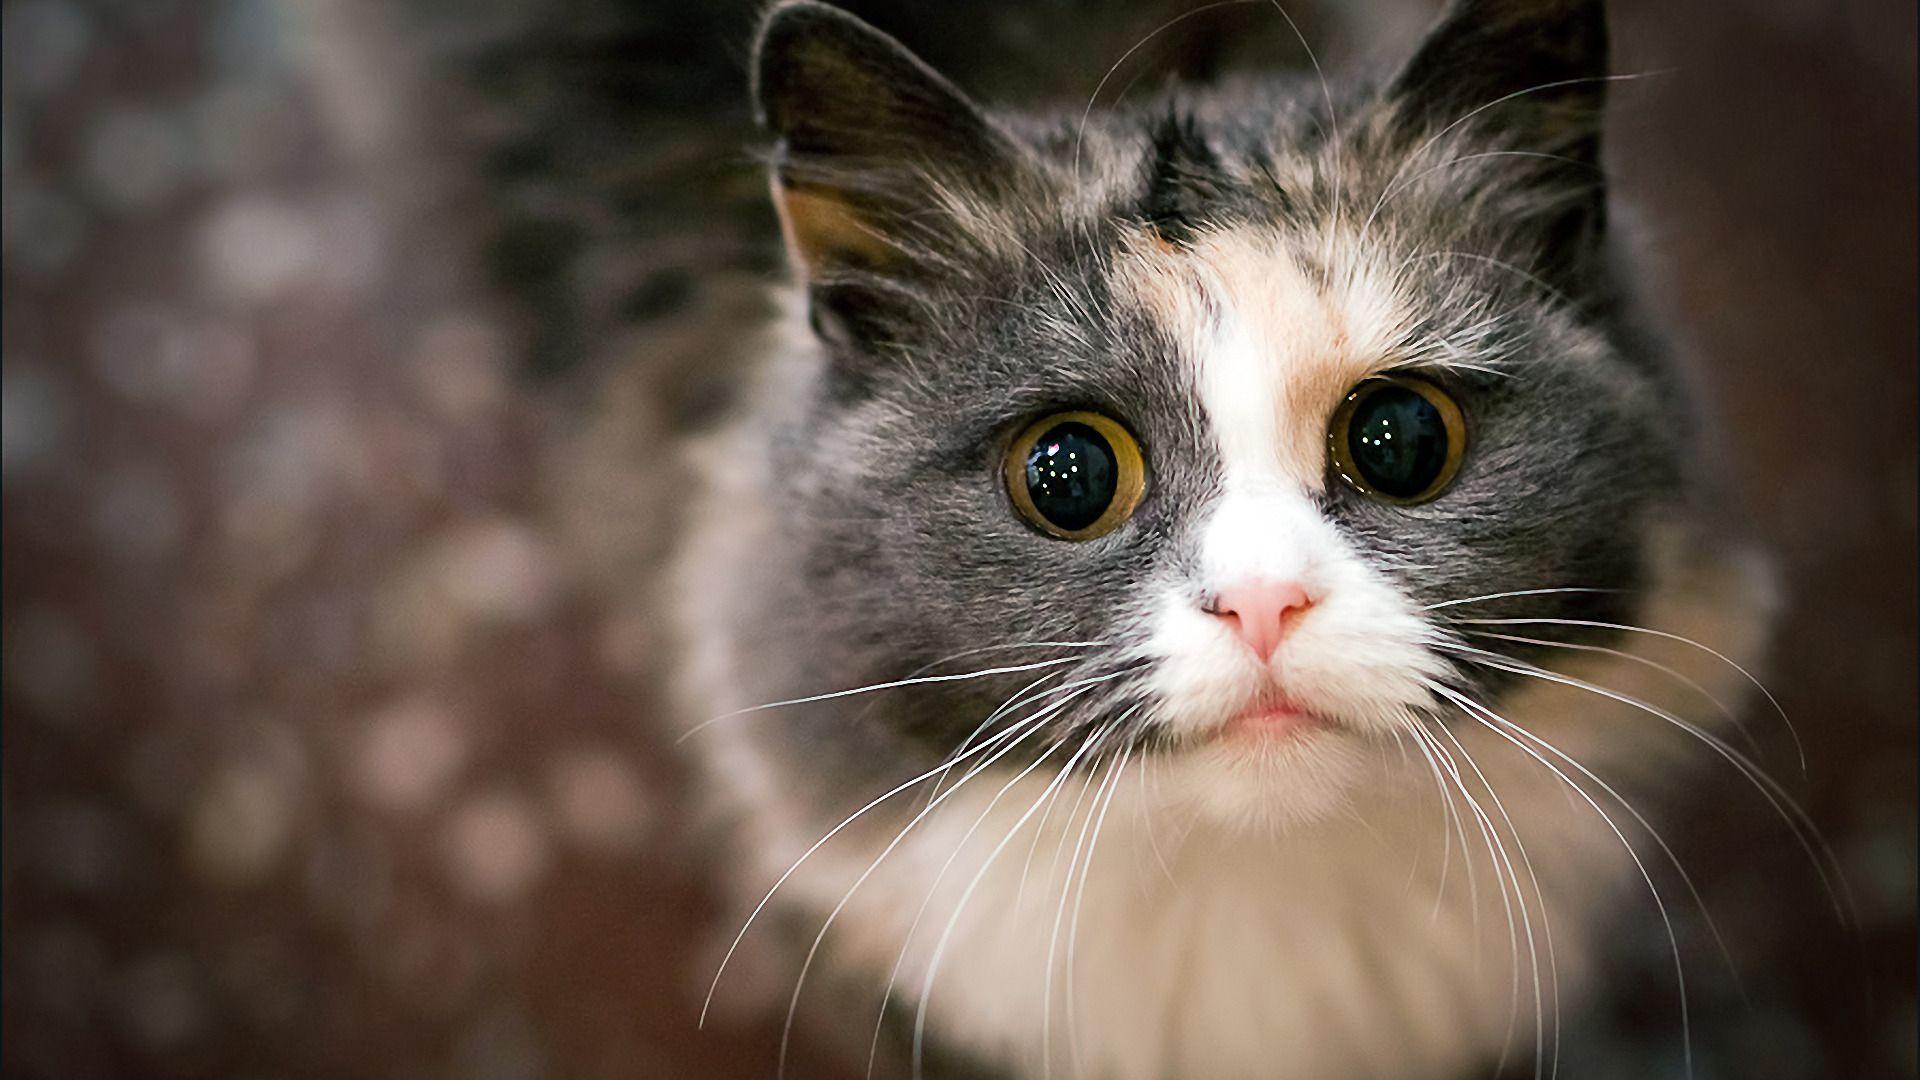 Wallpaper Desktop Cats